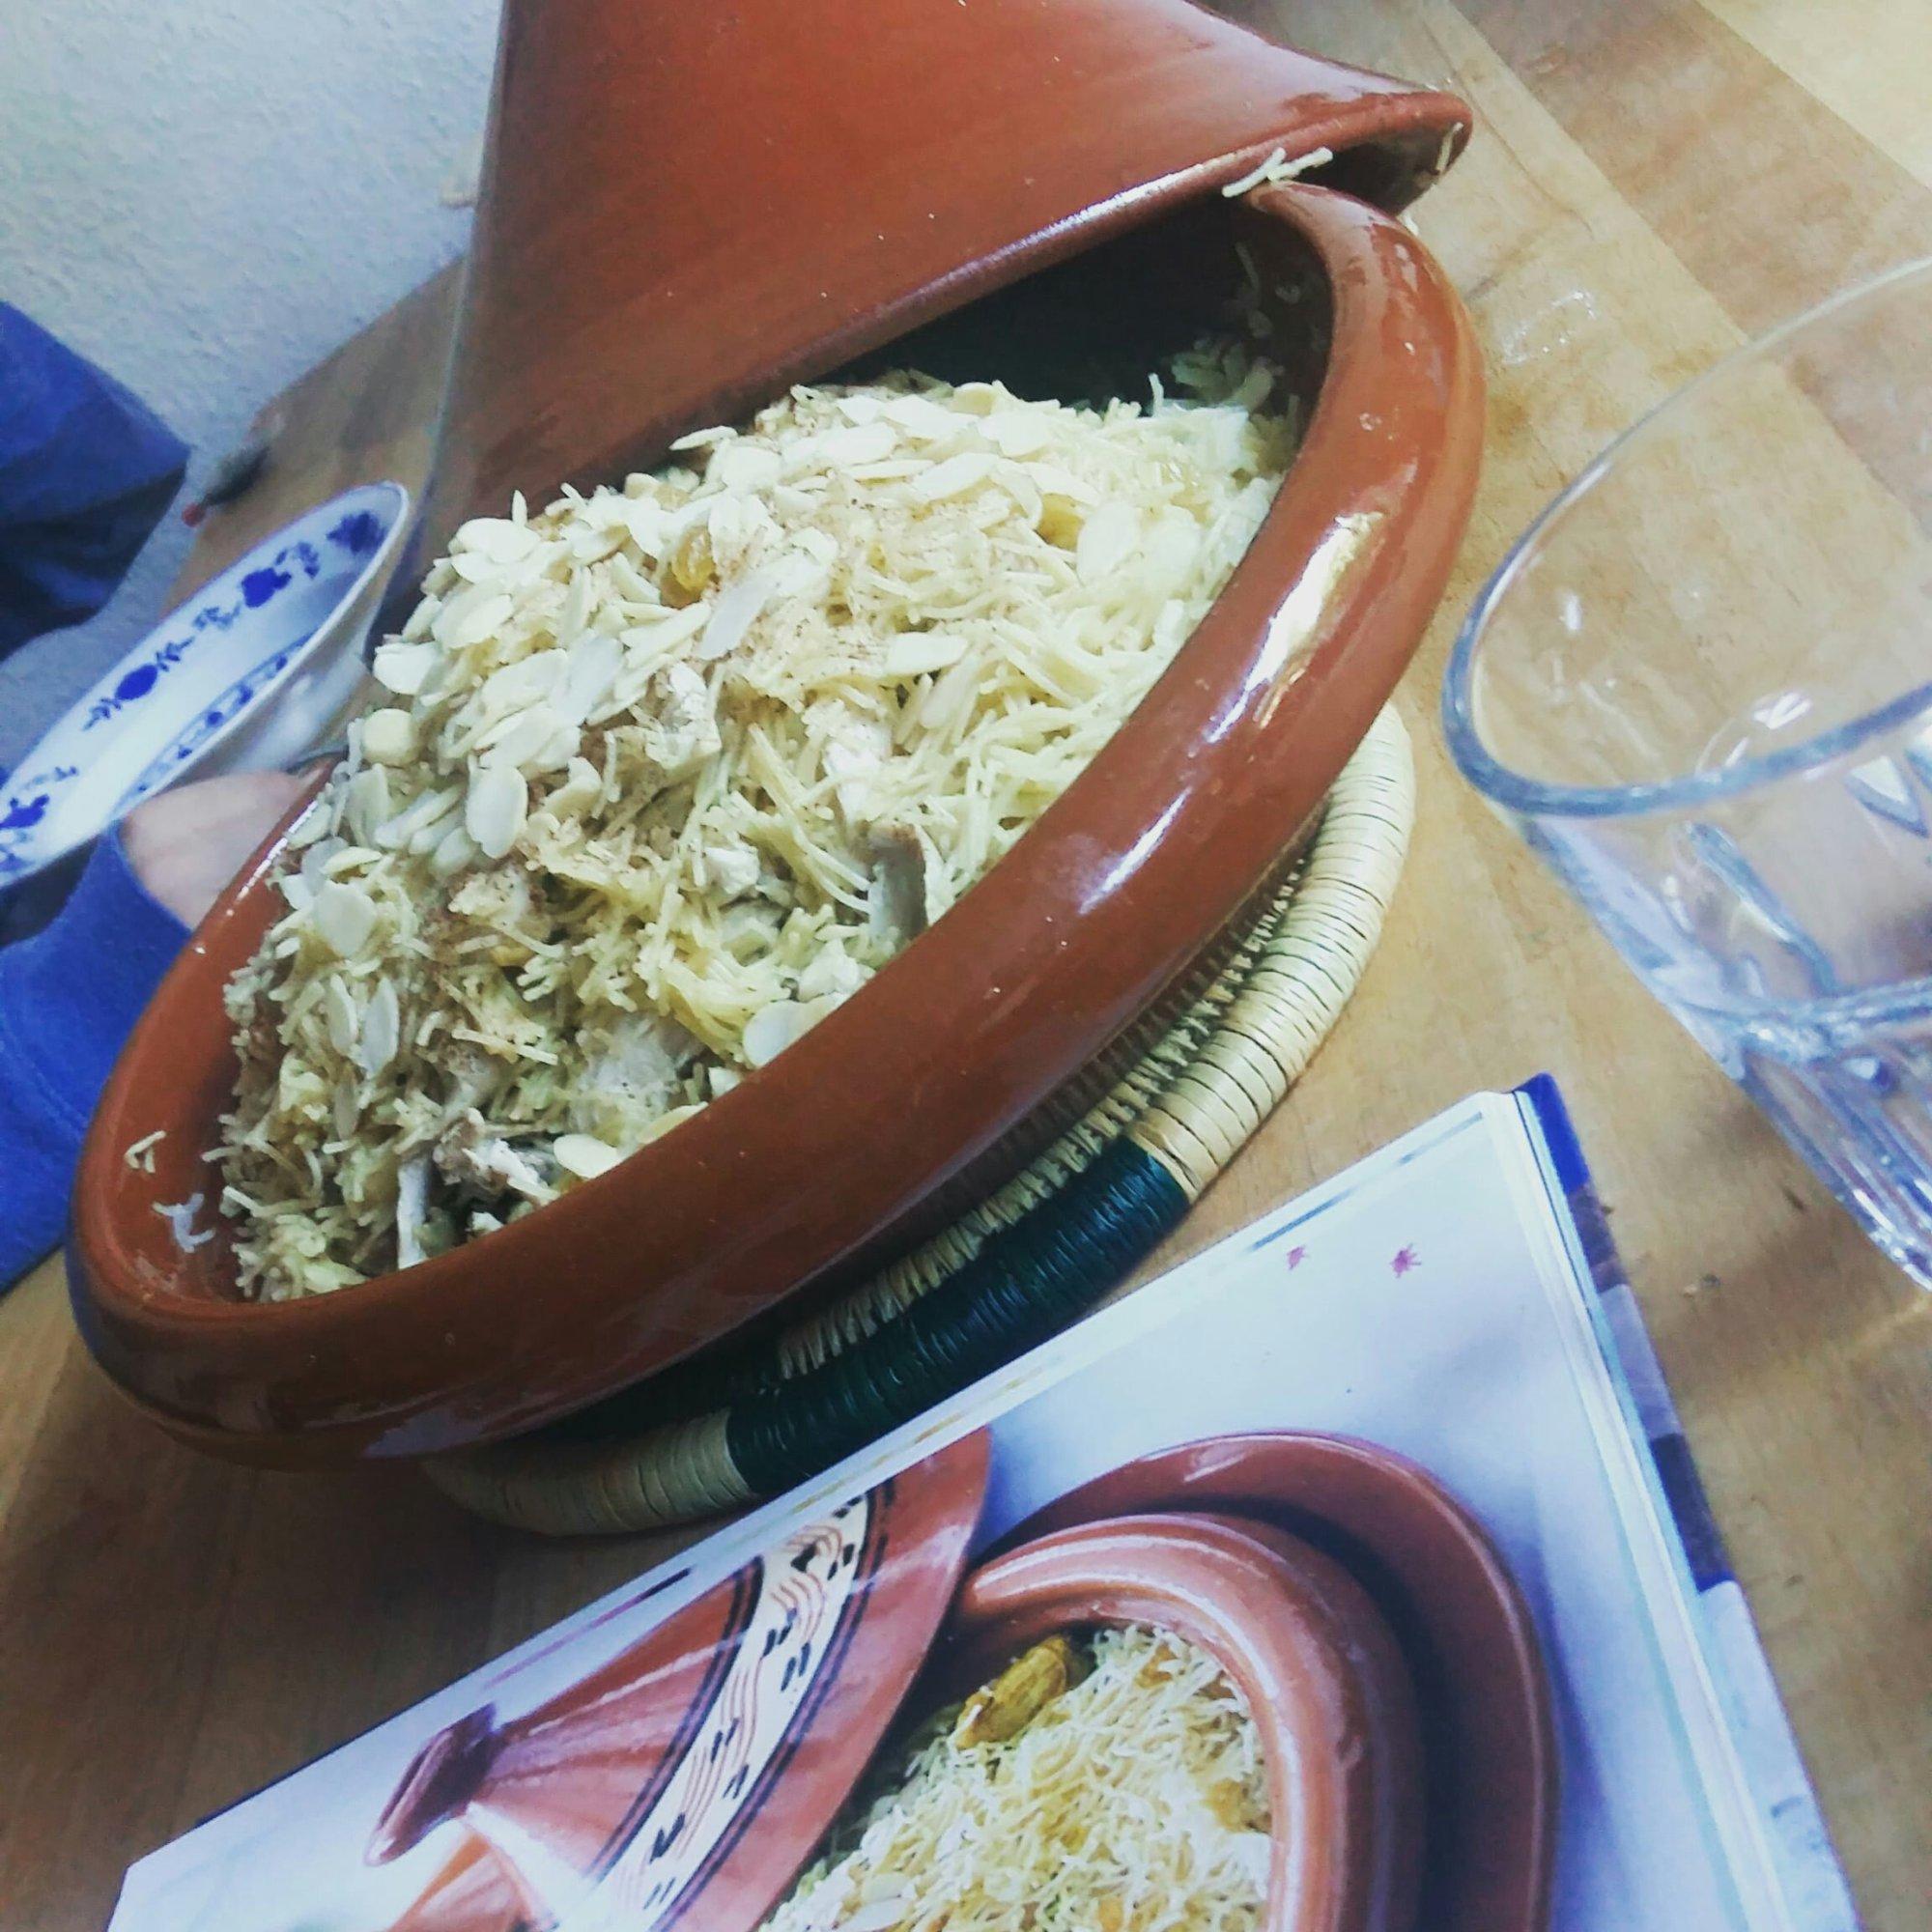 Marokko, Marokkanisch, kochen, Rezepte, Kochbuch, EMF, Marrakesch, orientalisch, Hähnchen, Huhn,